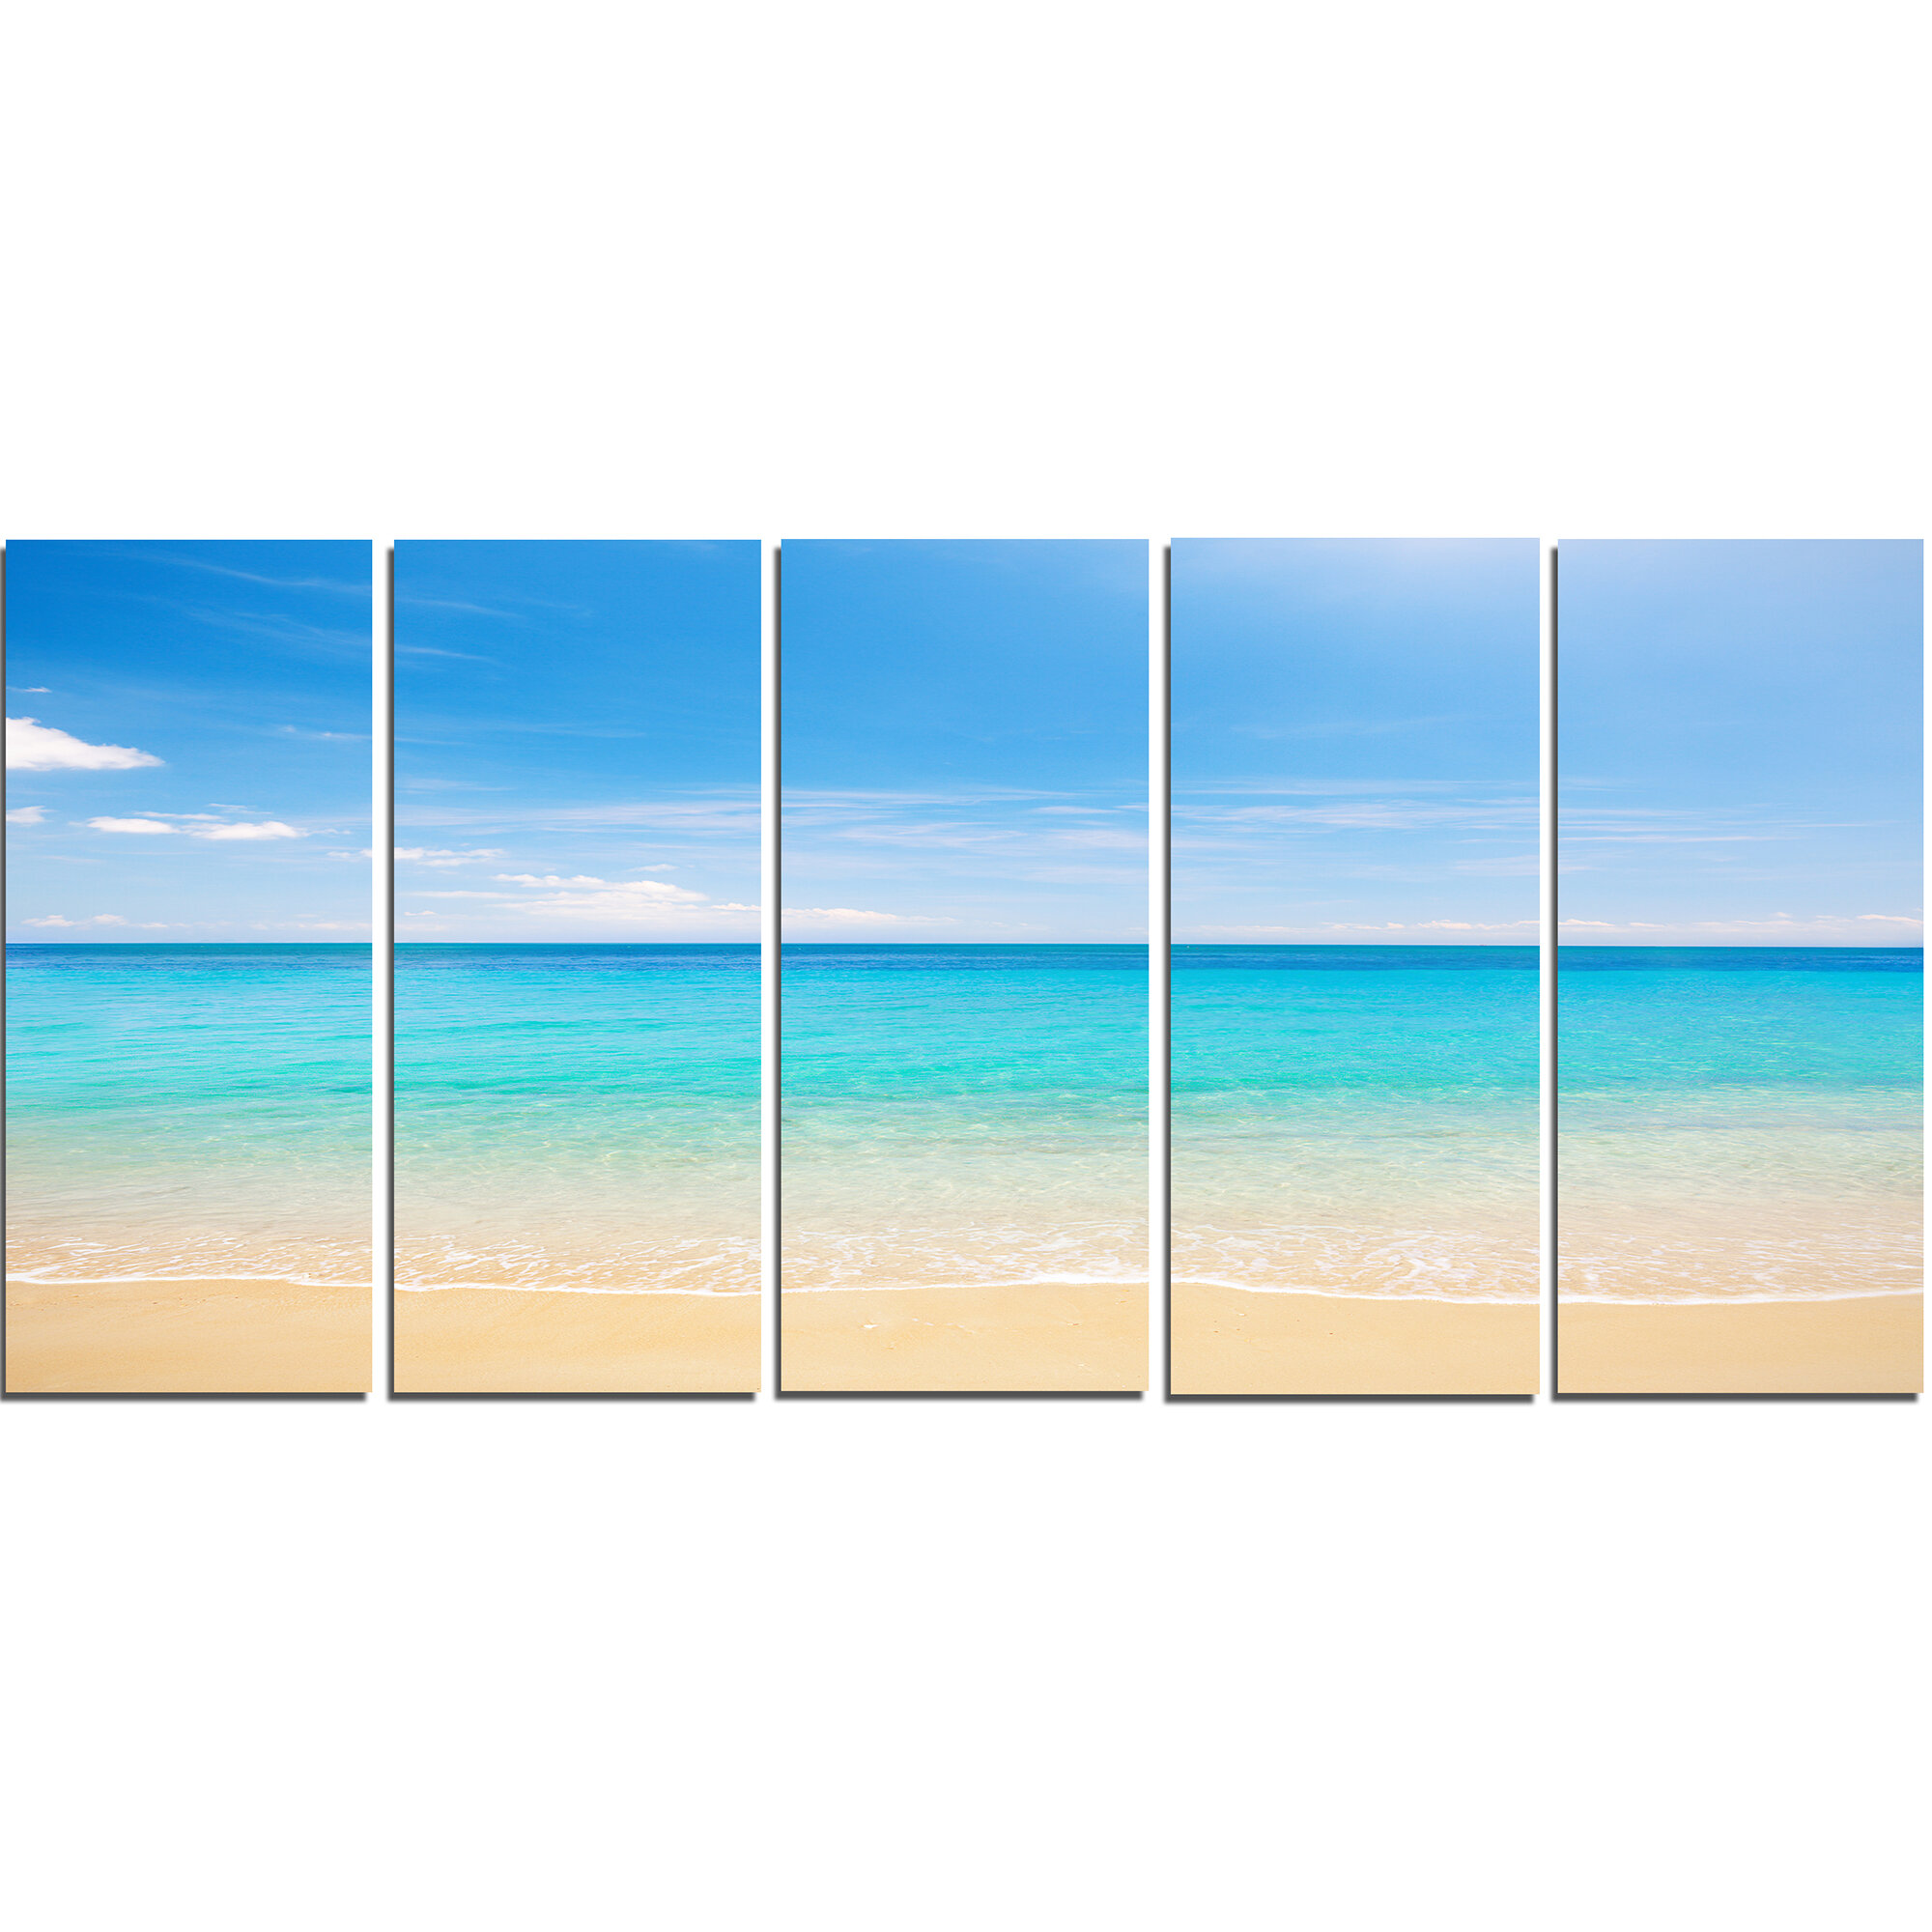 Designart Bright Blue Tropical Beach 5 Piece Wall Art On Wrapped Canvas Set Wayfair